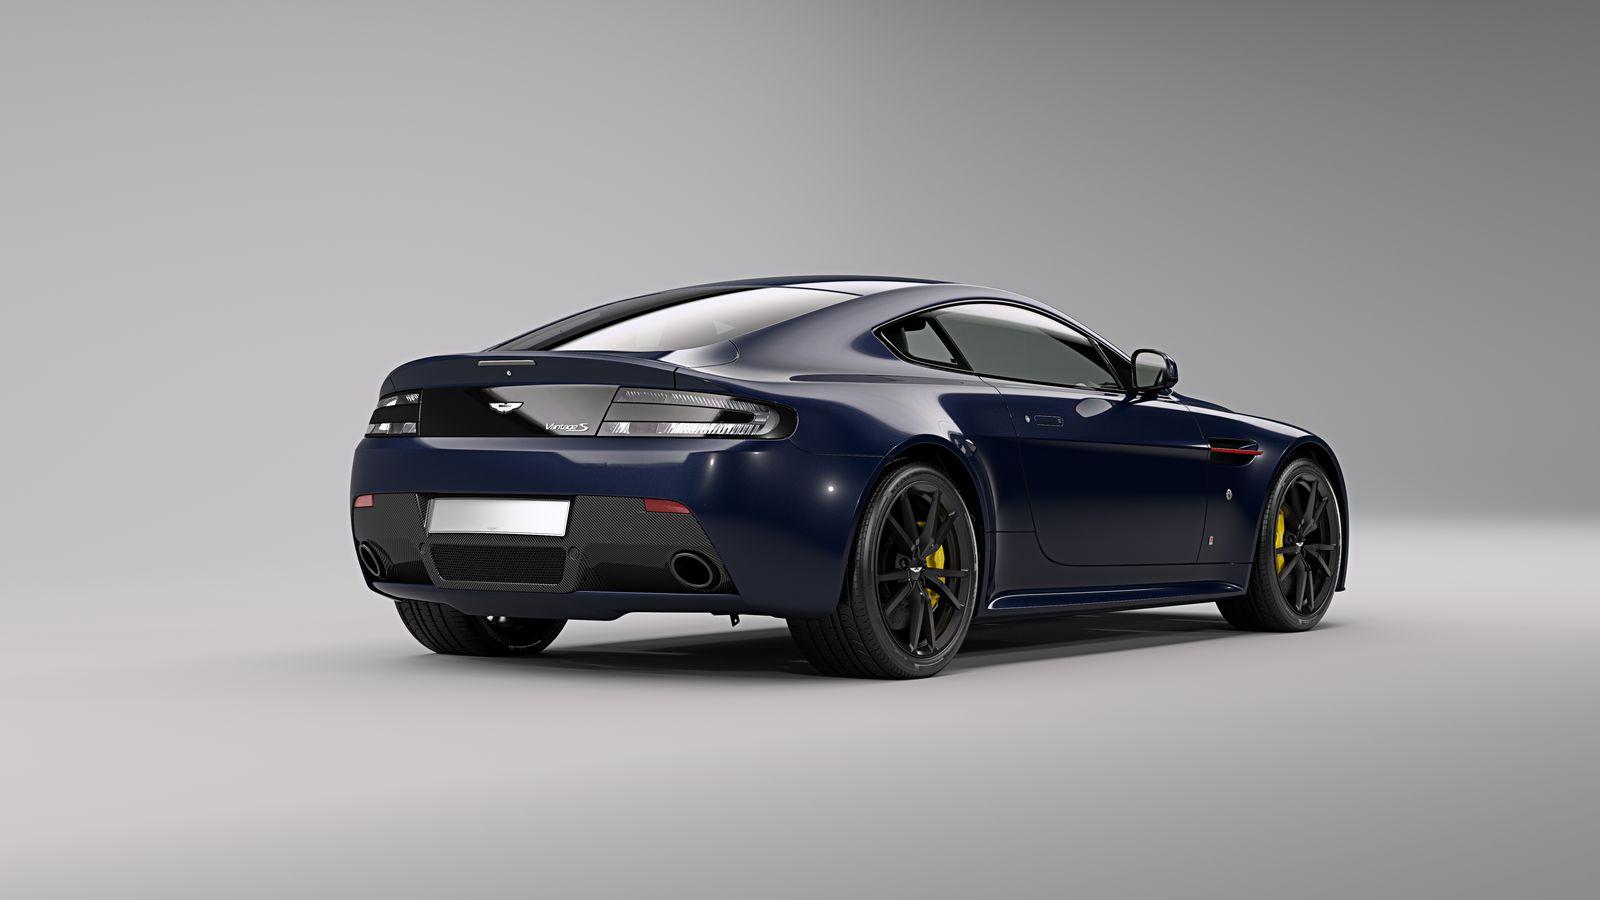 Aston Martin V8 and V12 Vantage Red Bull Racing Editions (4)